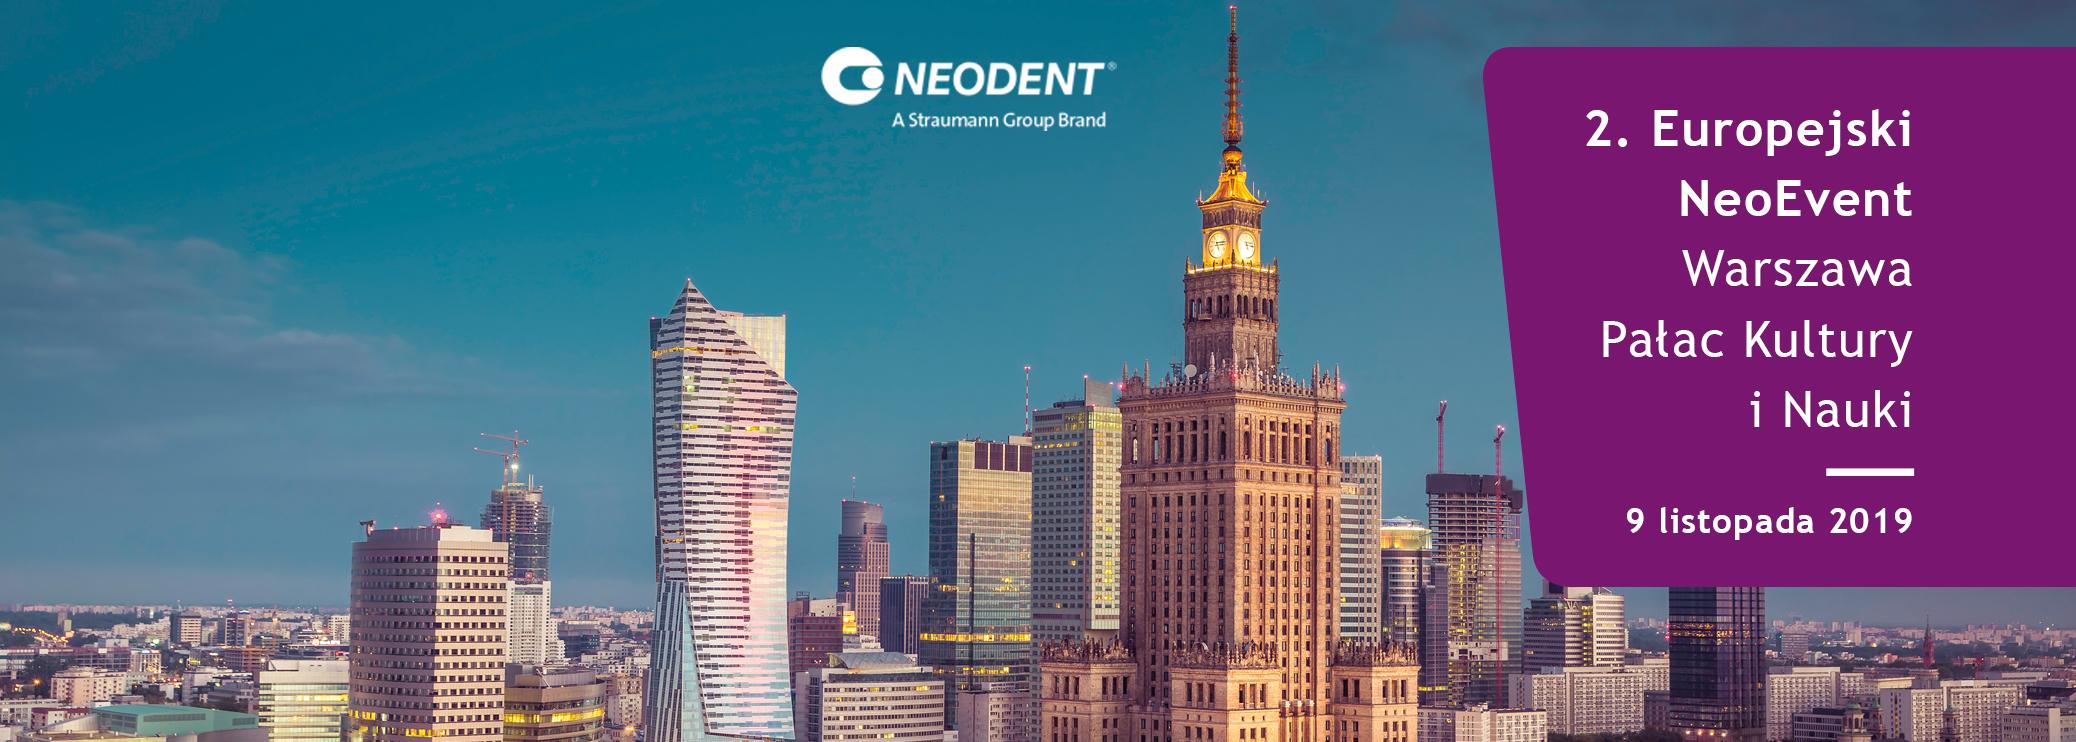 2. Europejski NeoEvent Warszawa